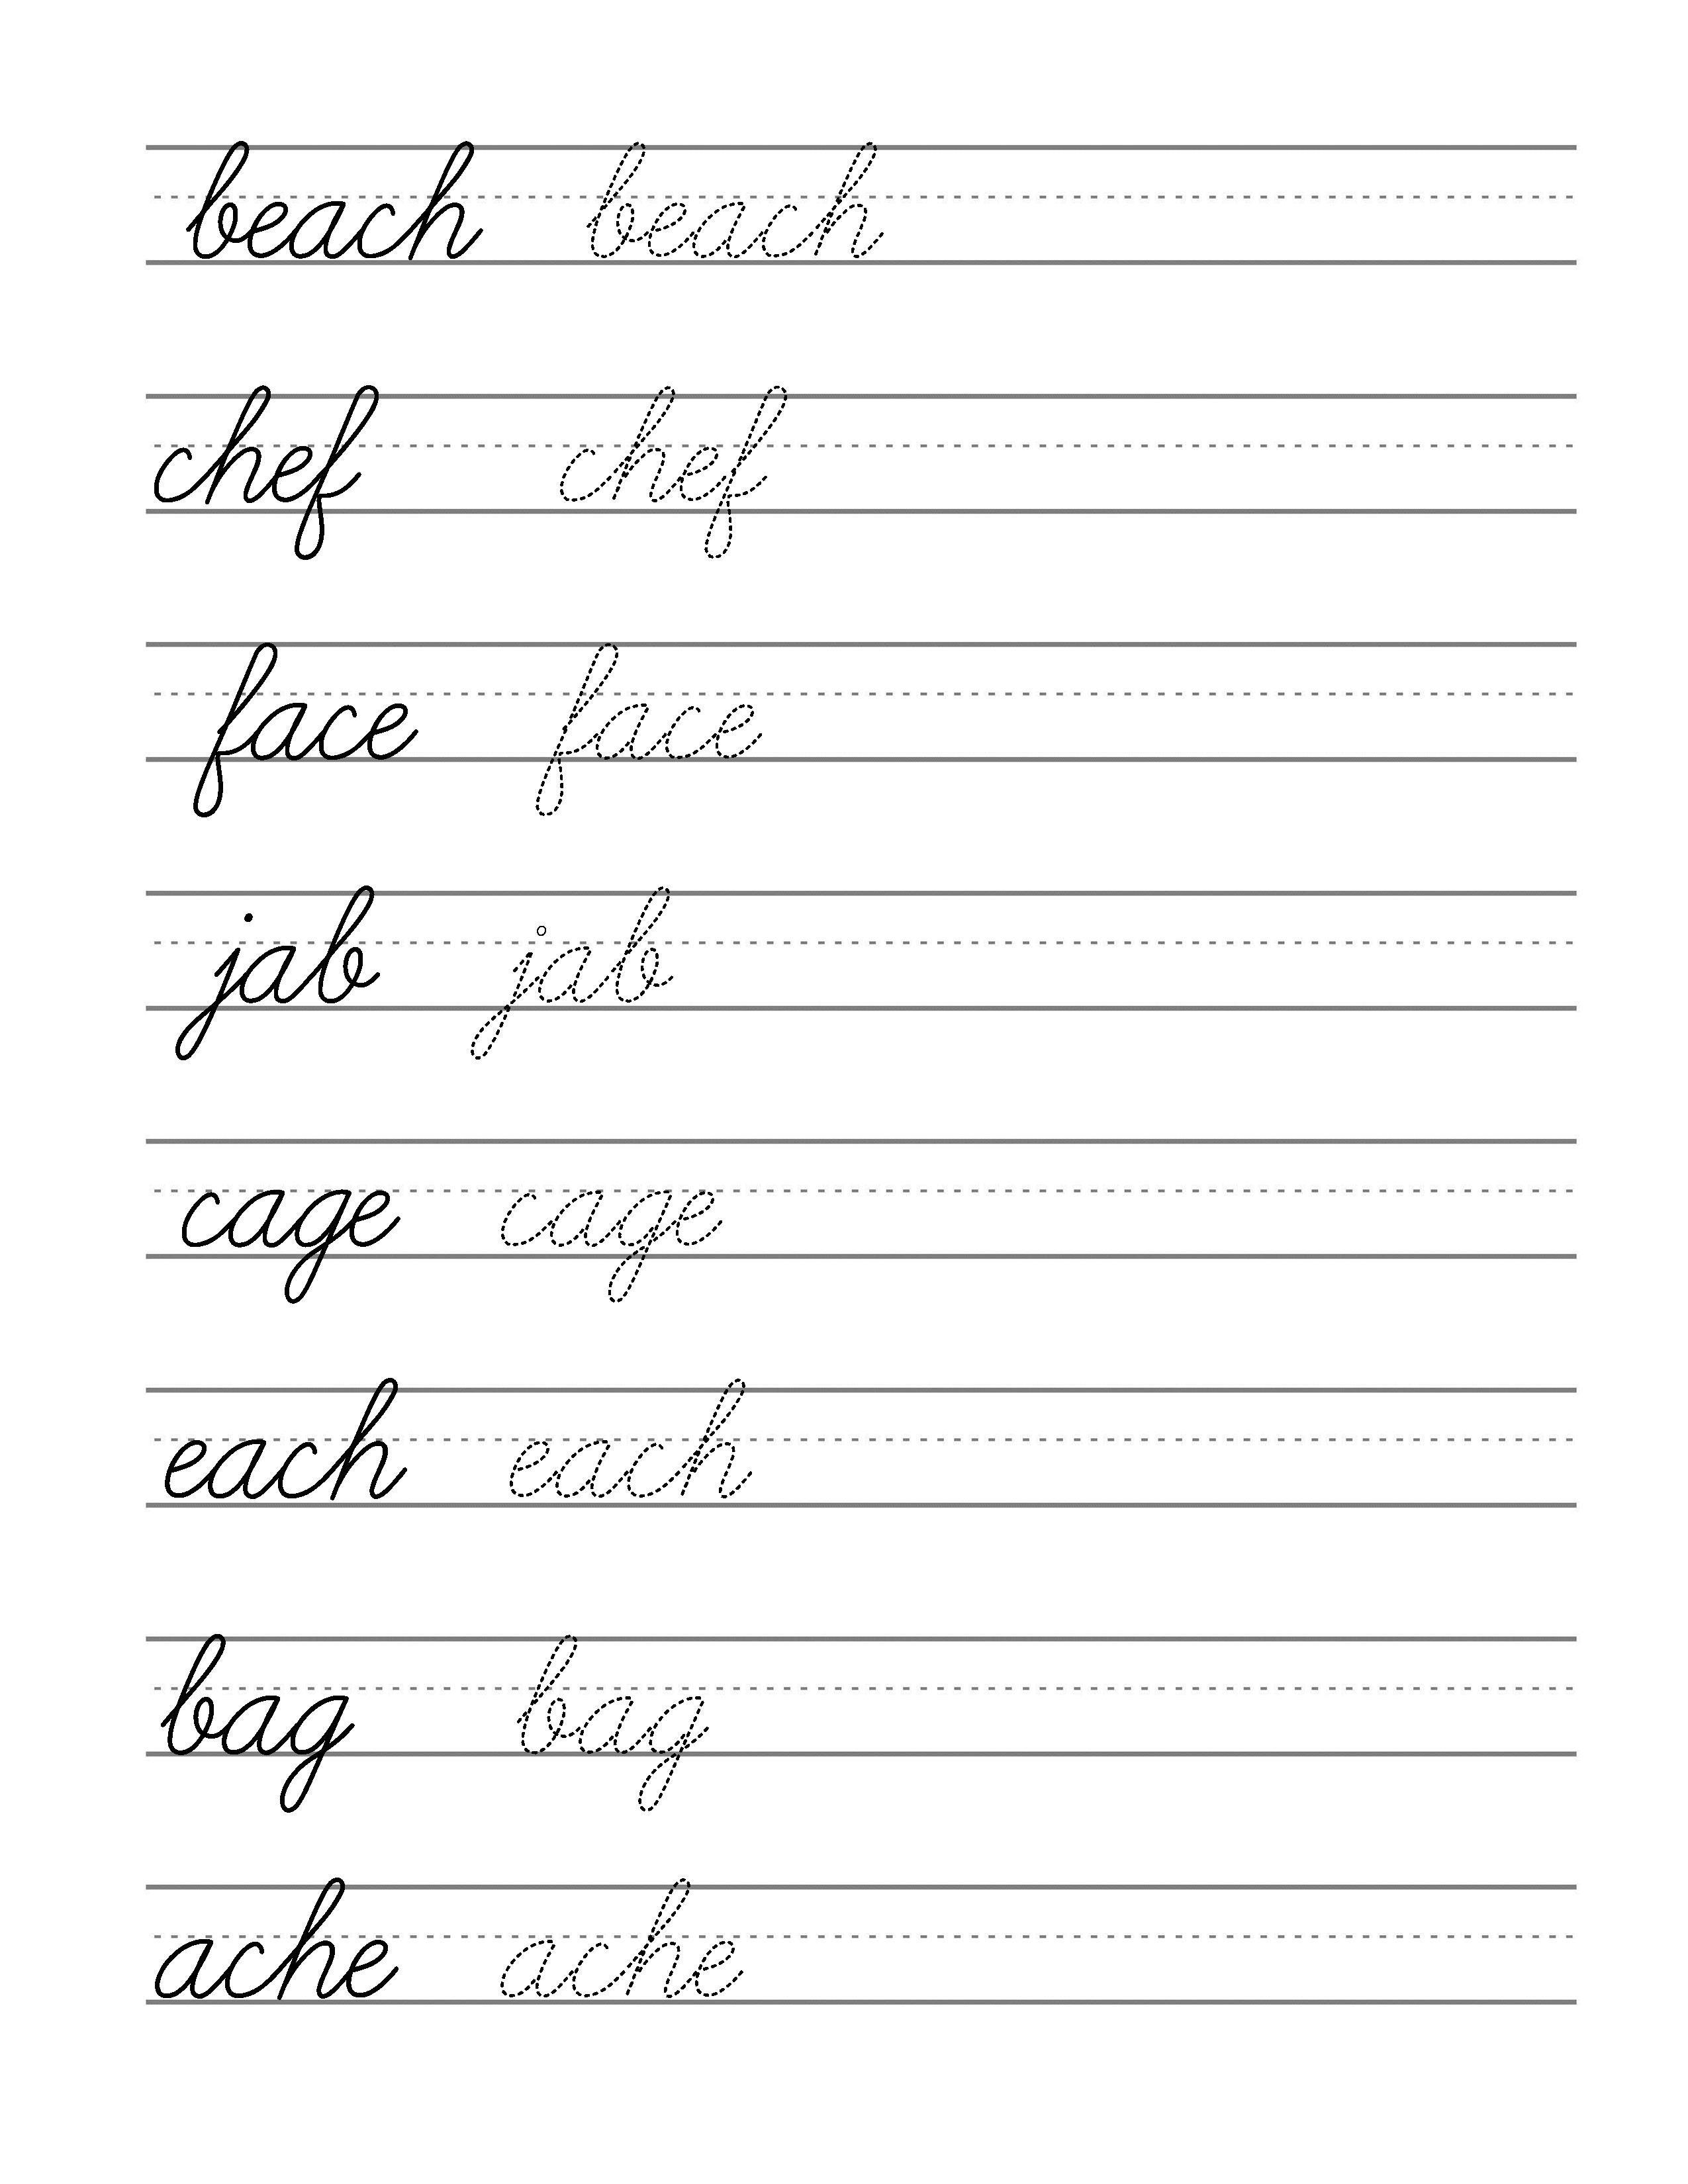 Free beginning cursive - writing template Part 3   Cursive writing  worksheets [ 3300 x 2550 Pixel ]